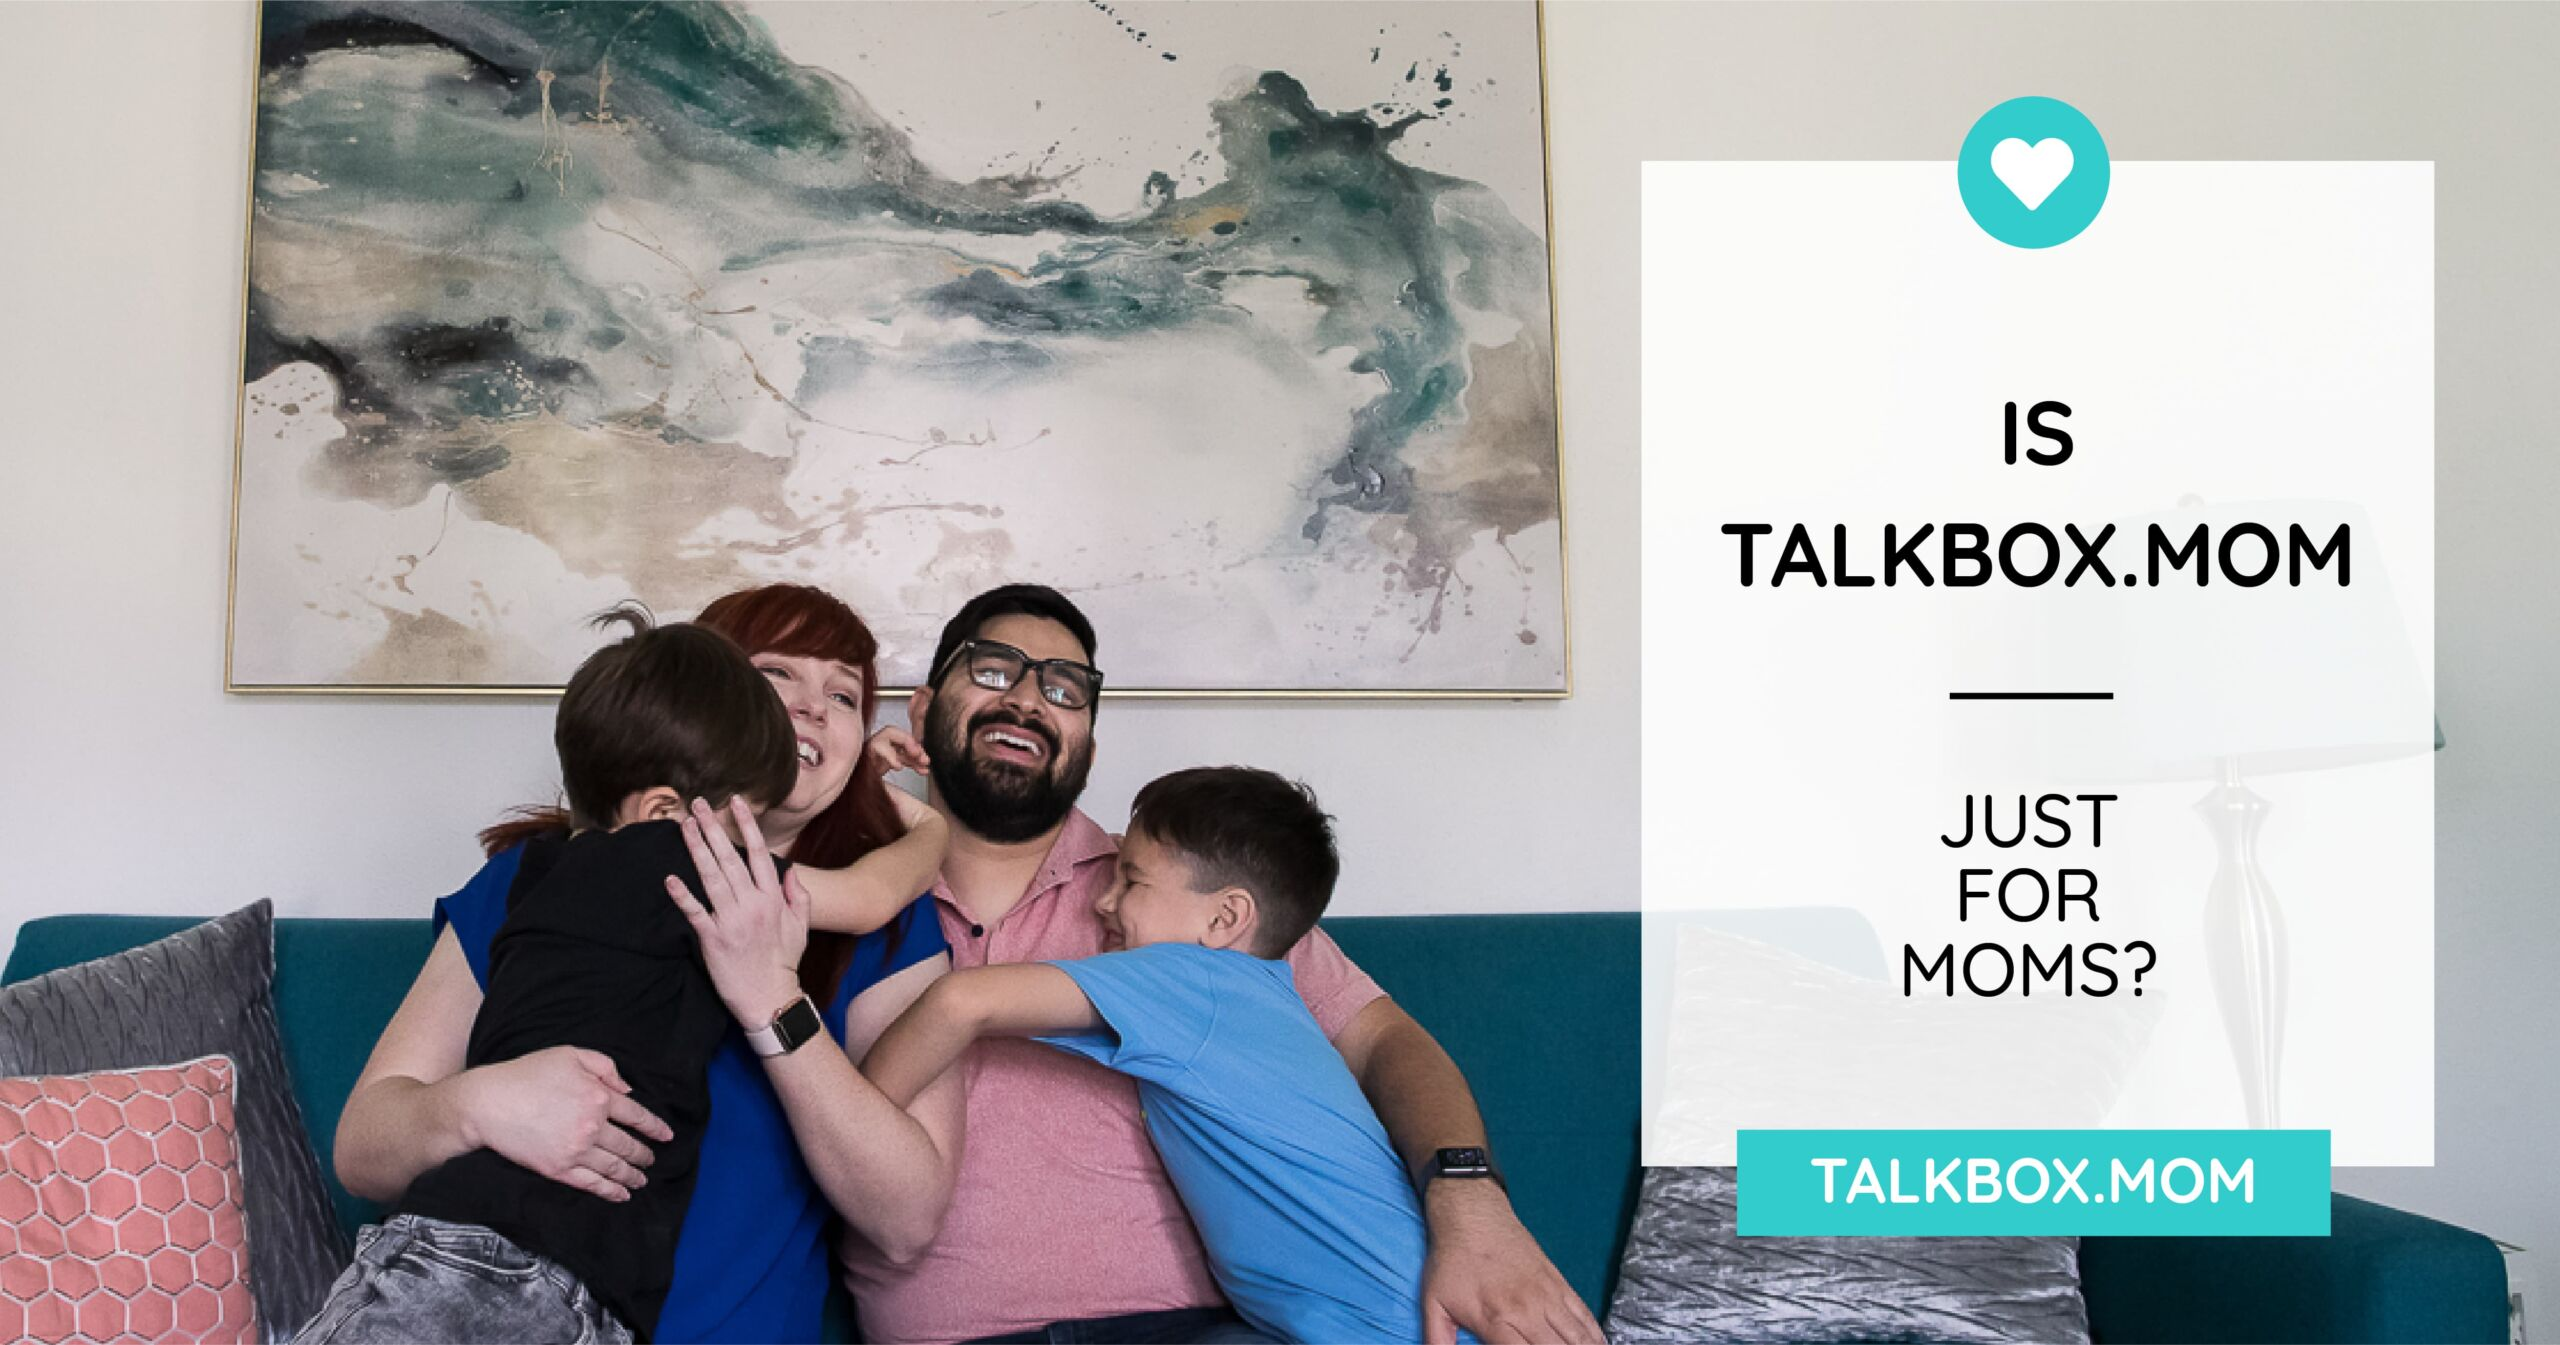 Is TalkBoxMom Just for Moms